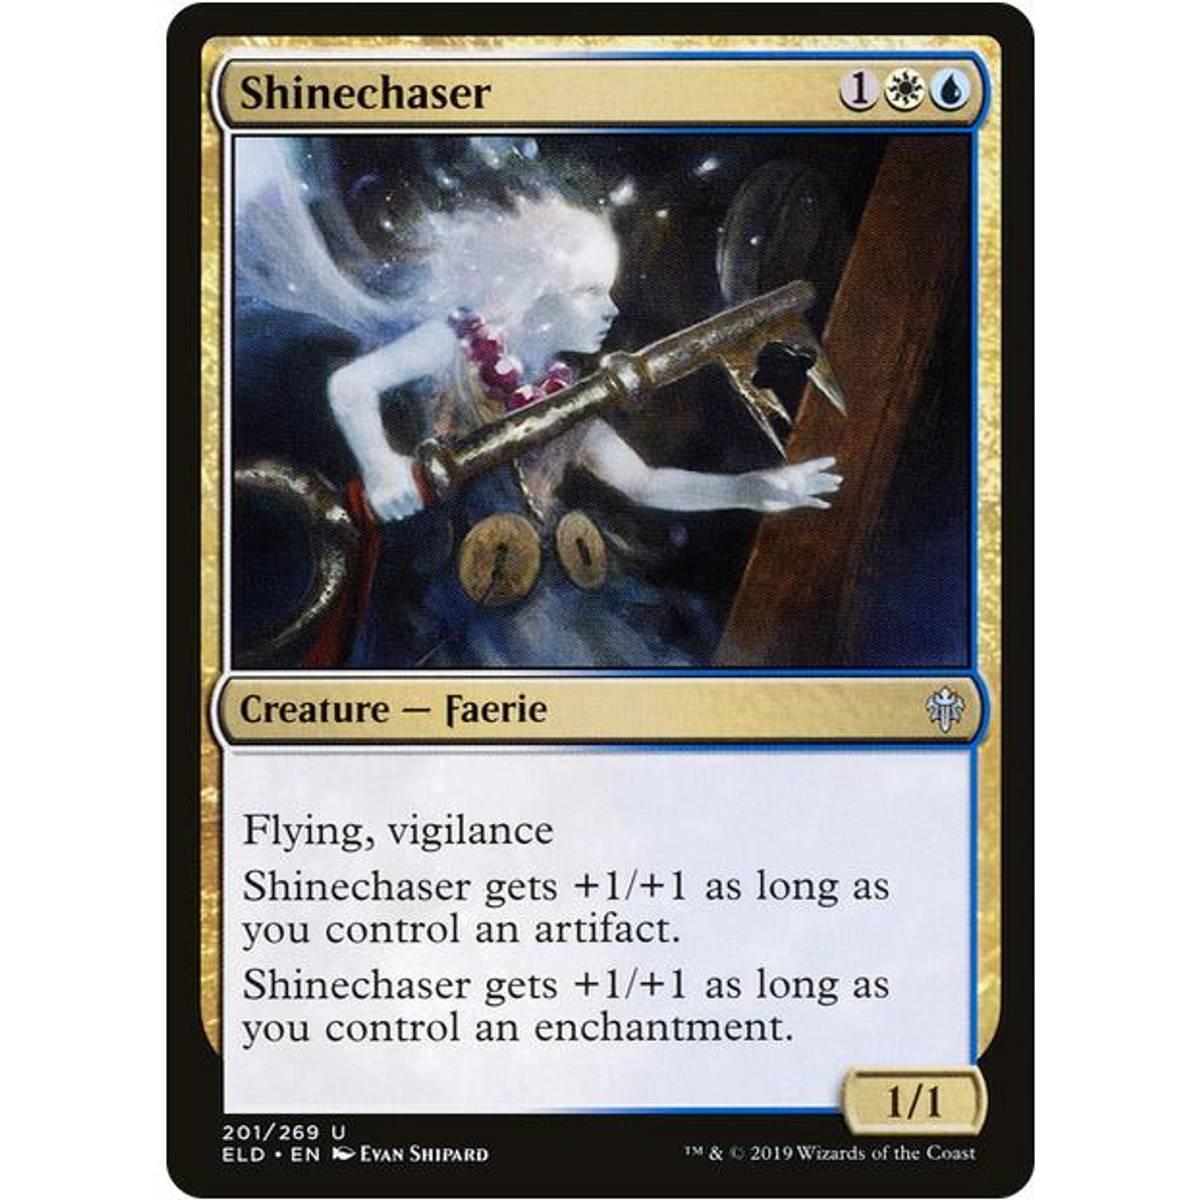 Shinechaser